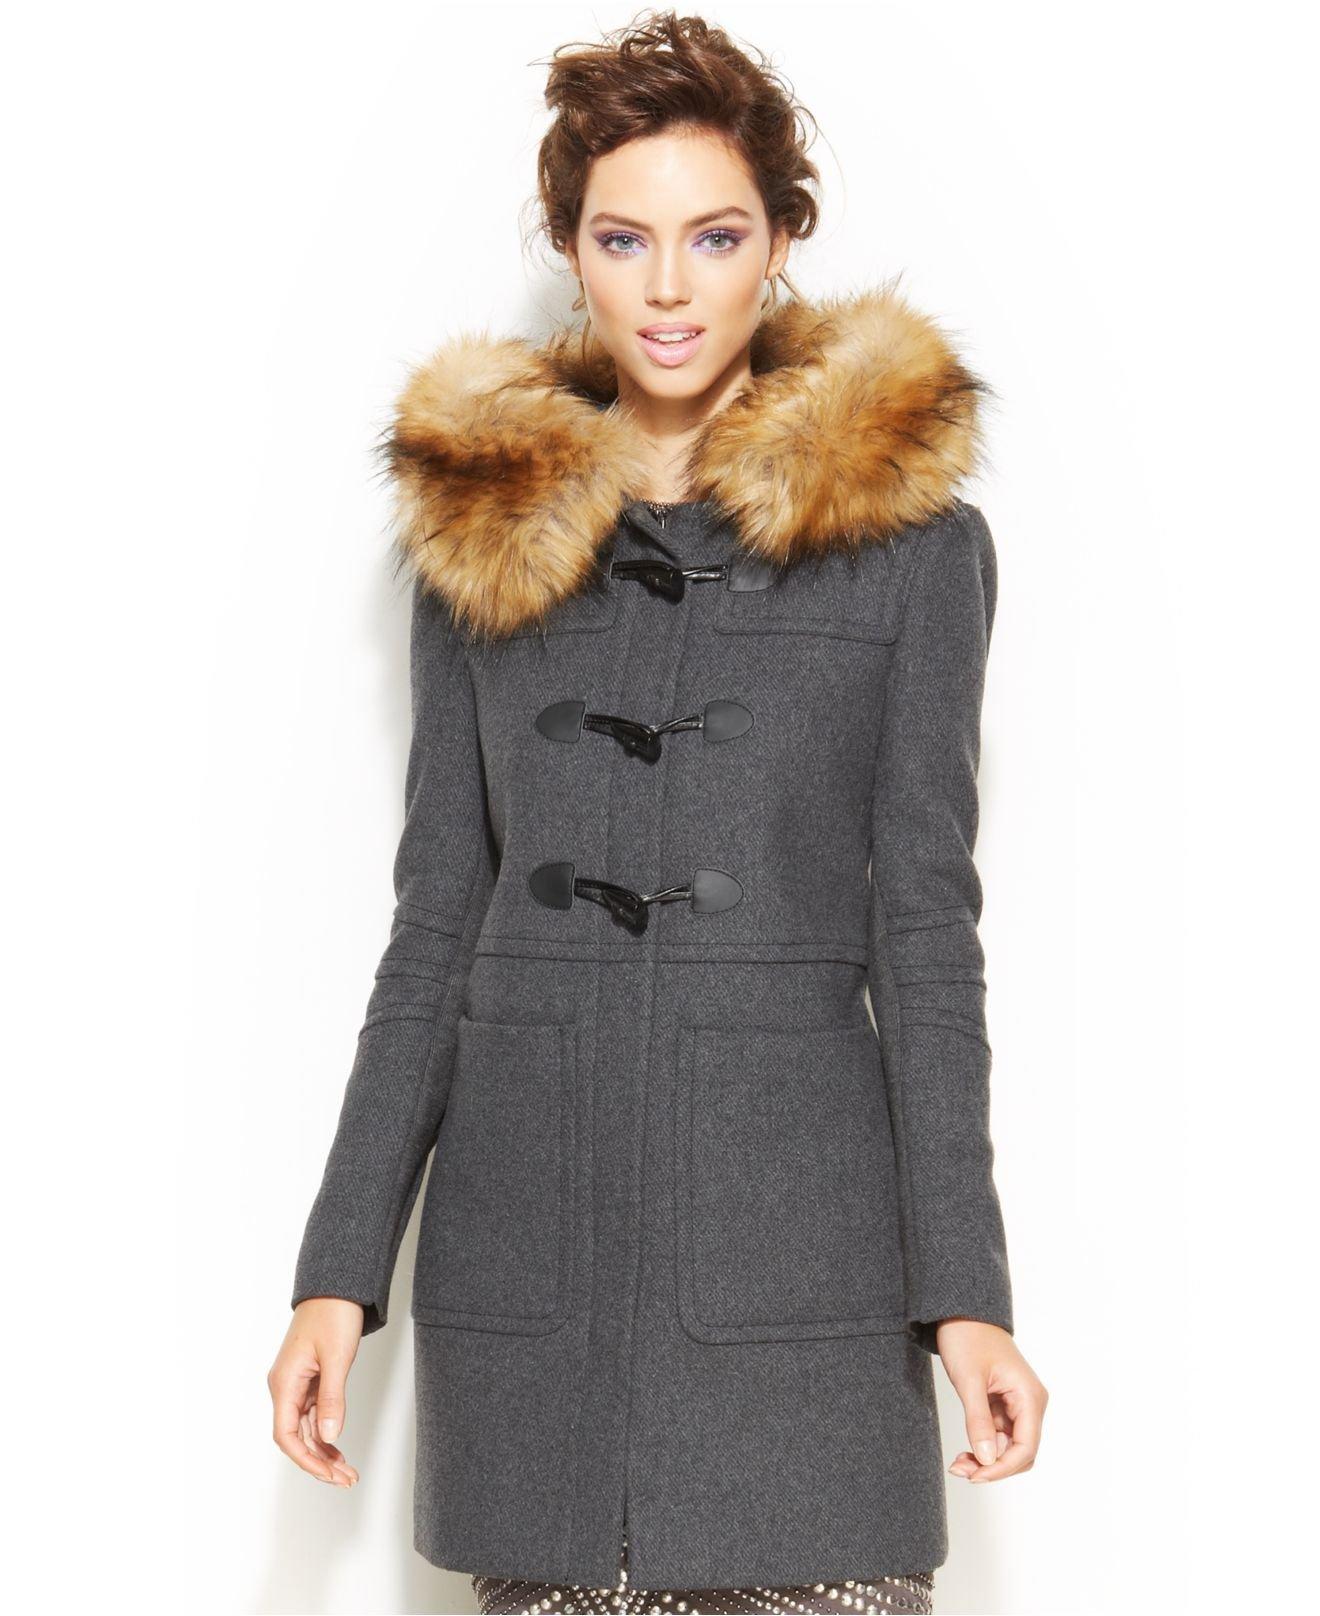 Womens Tweed Winter Coats - Tradingbasis